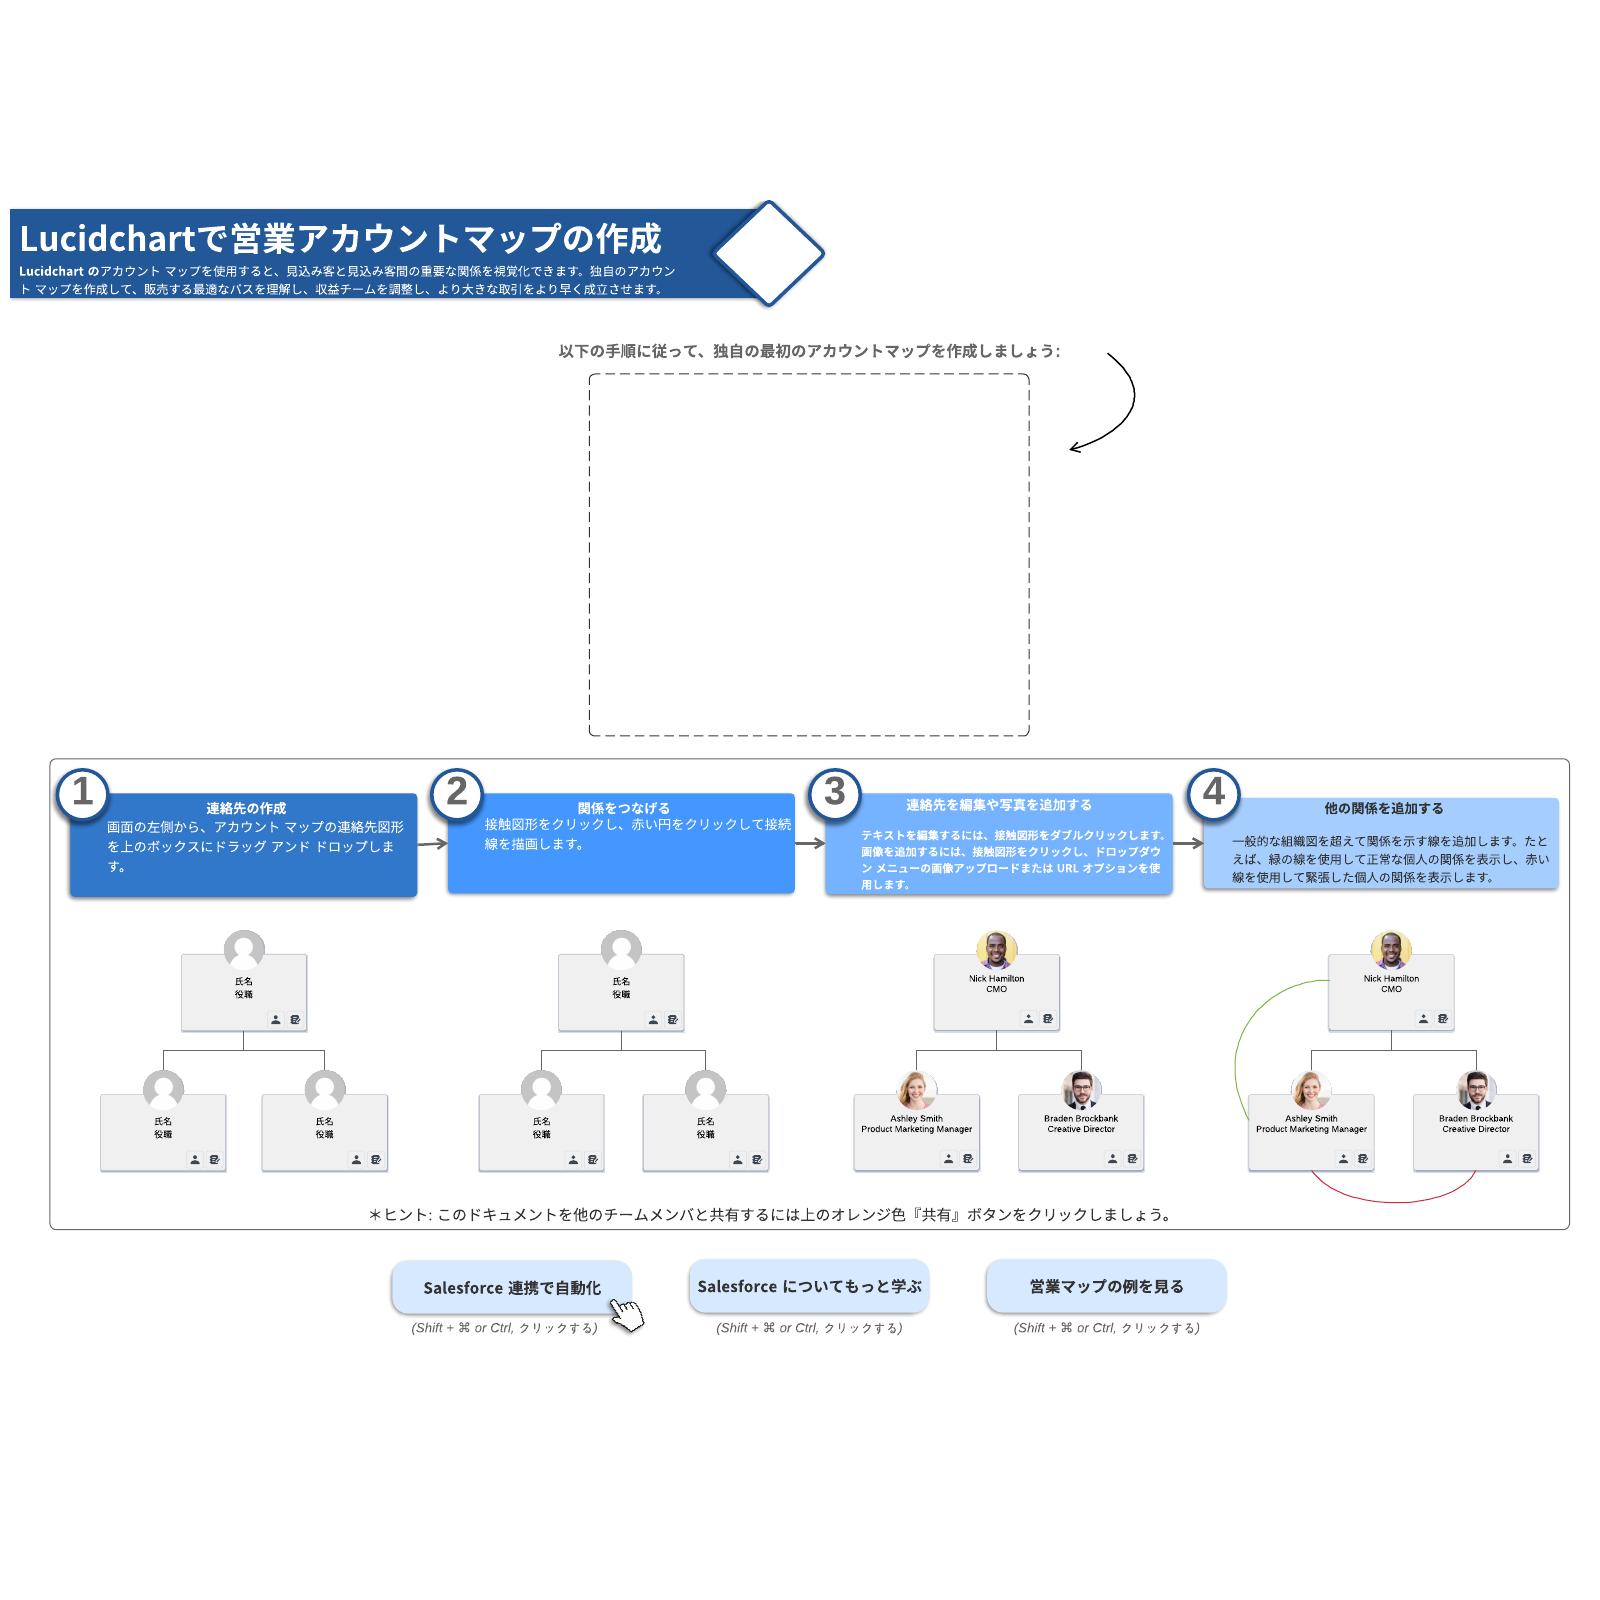 Salesforce 営業アカウントマップガイド